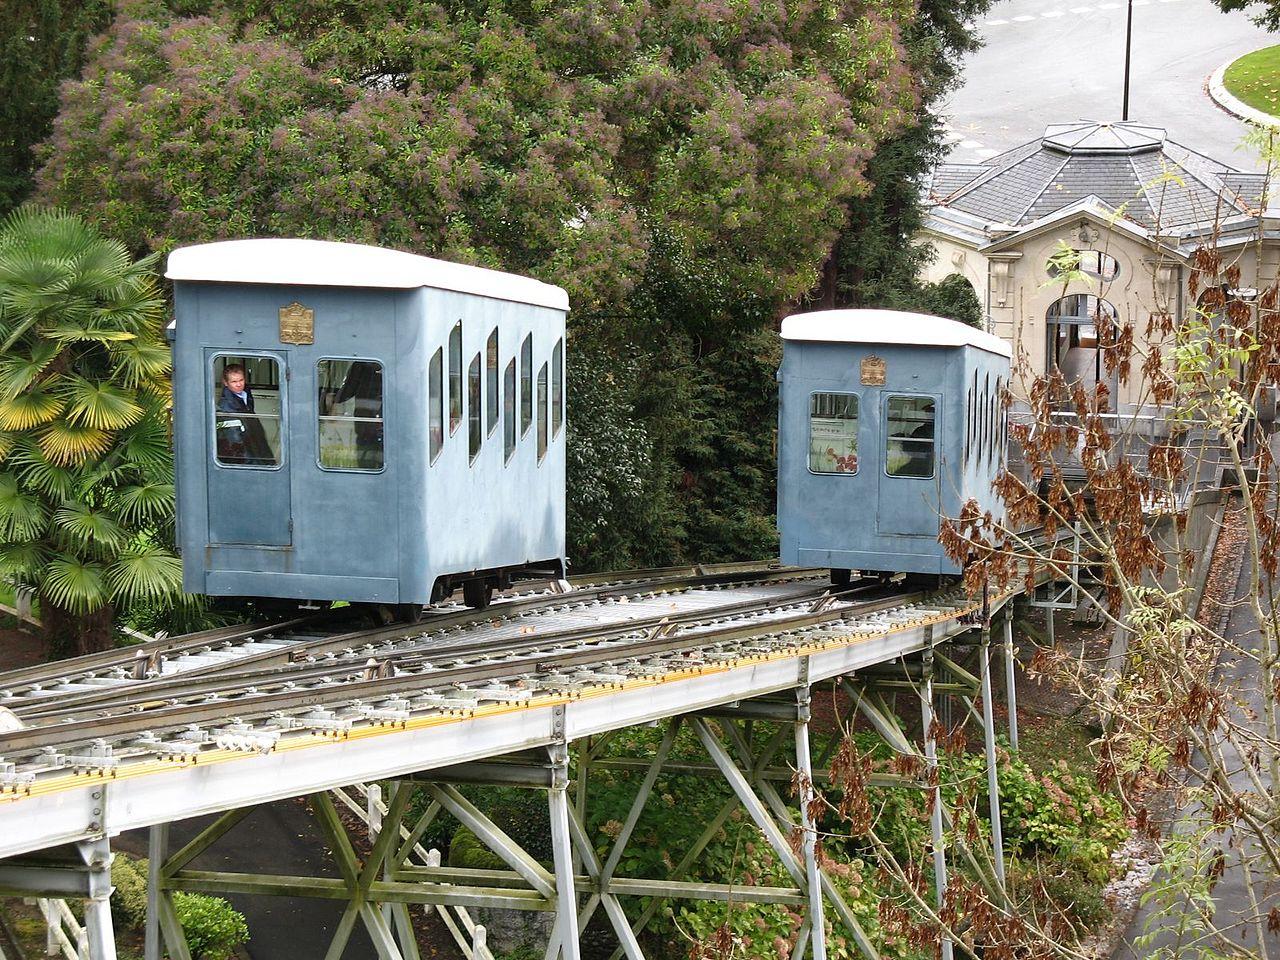 El funicular de Pau